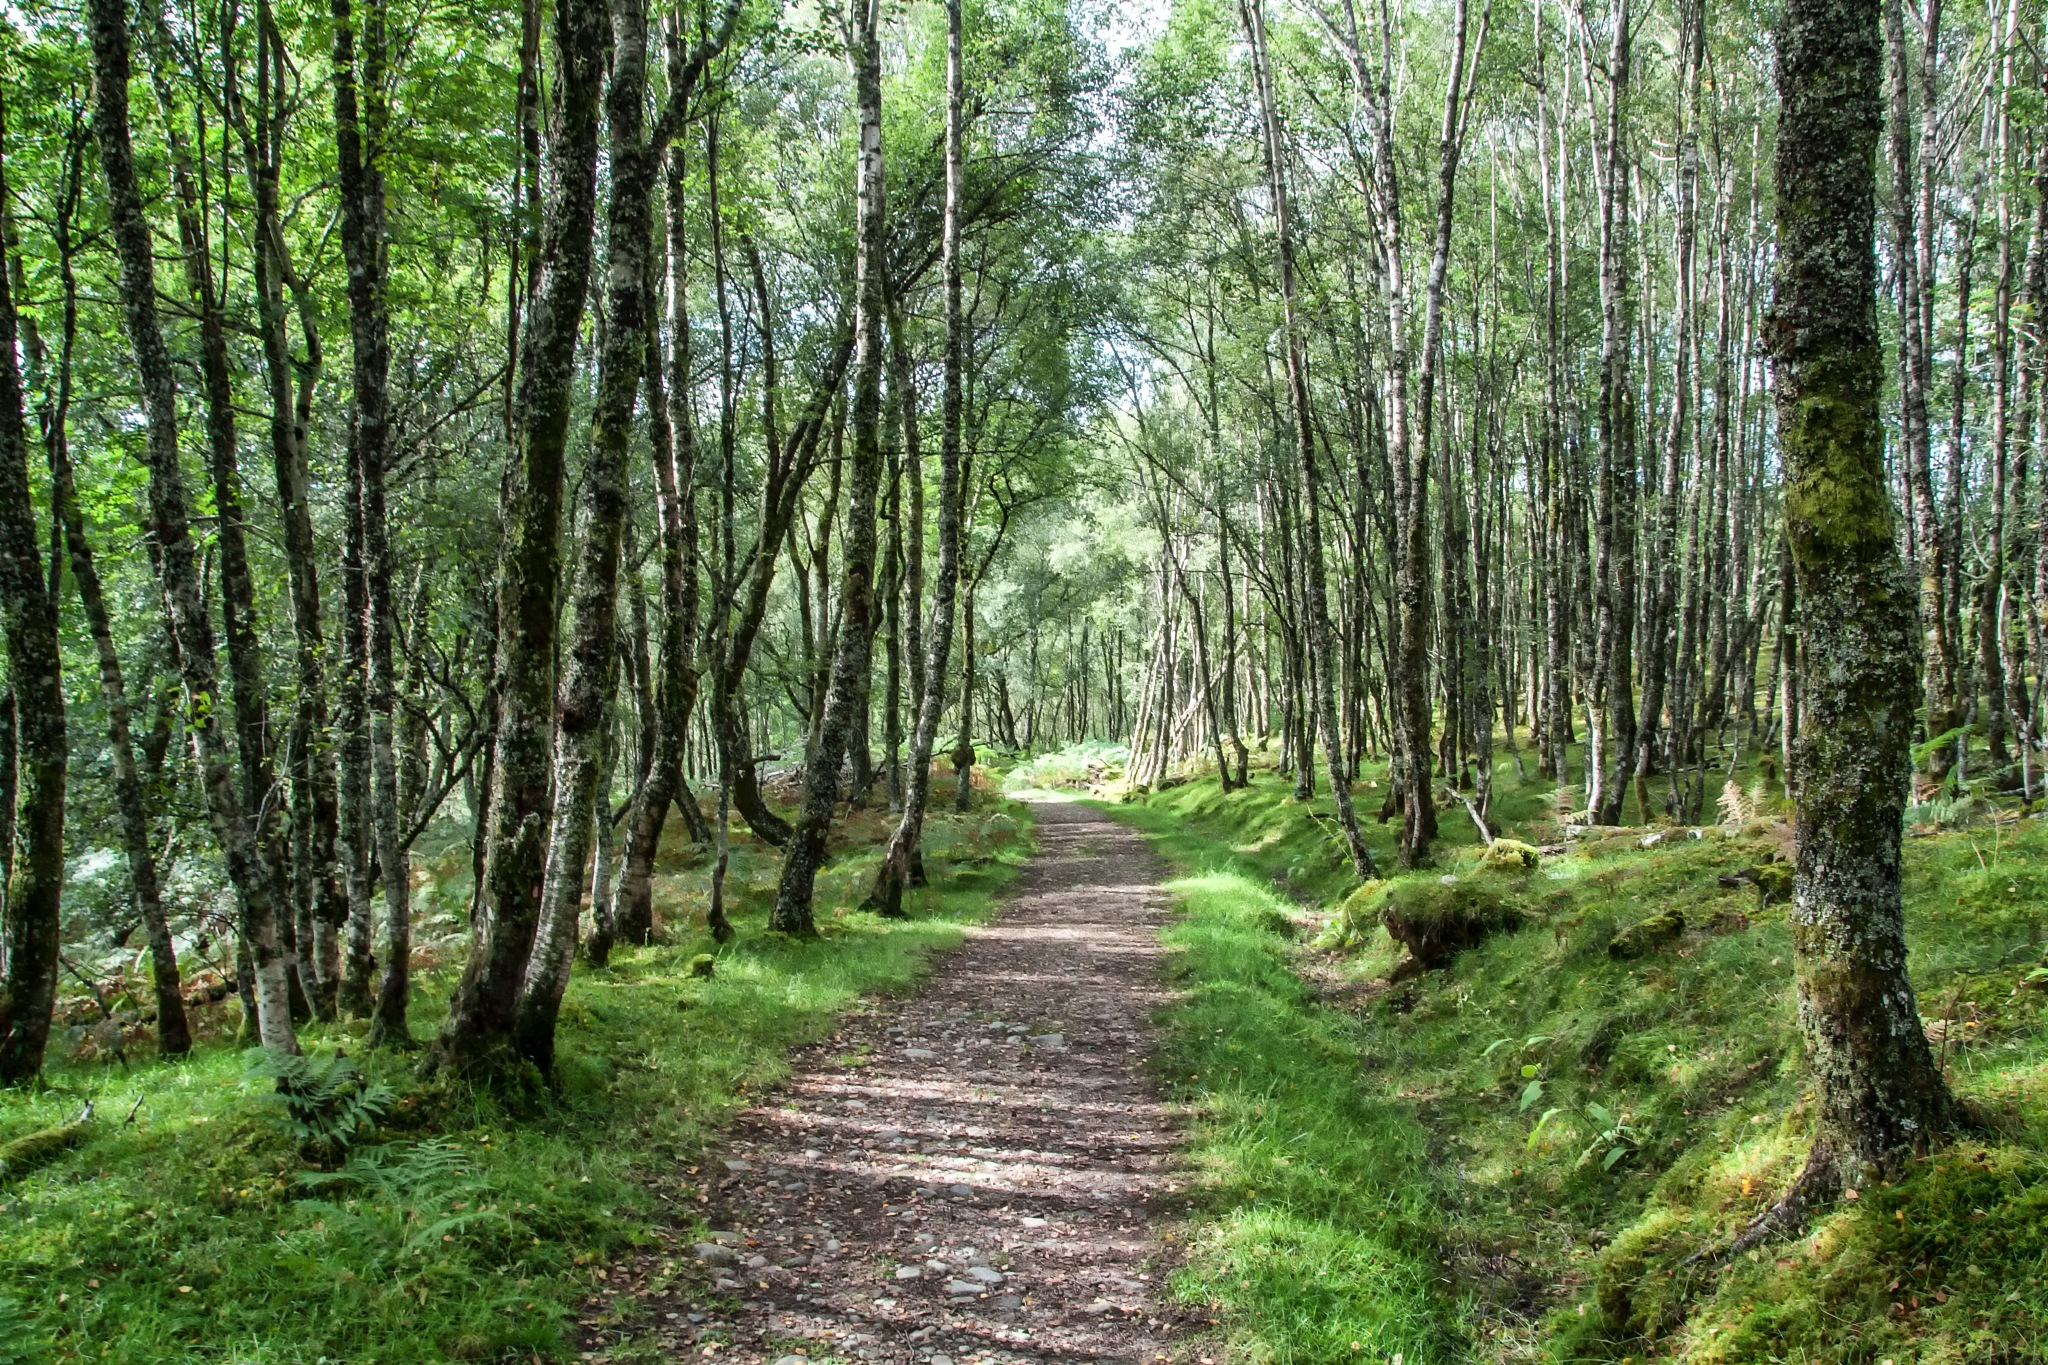 Woodland Walk by martin.davis.5243817